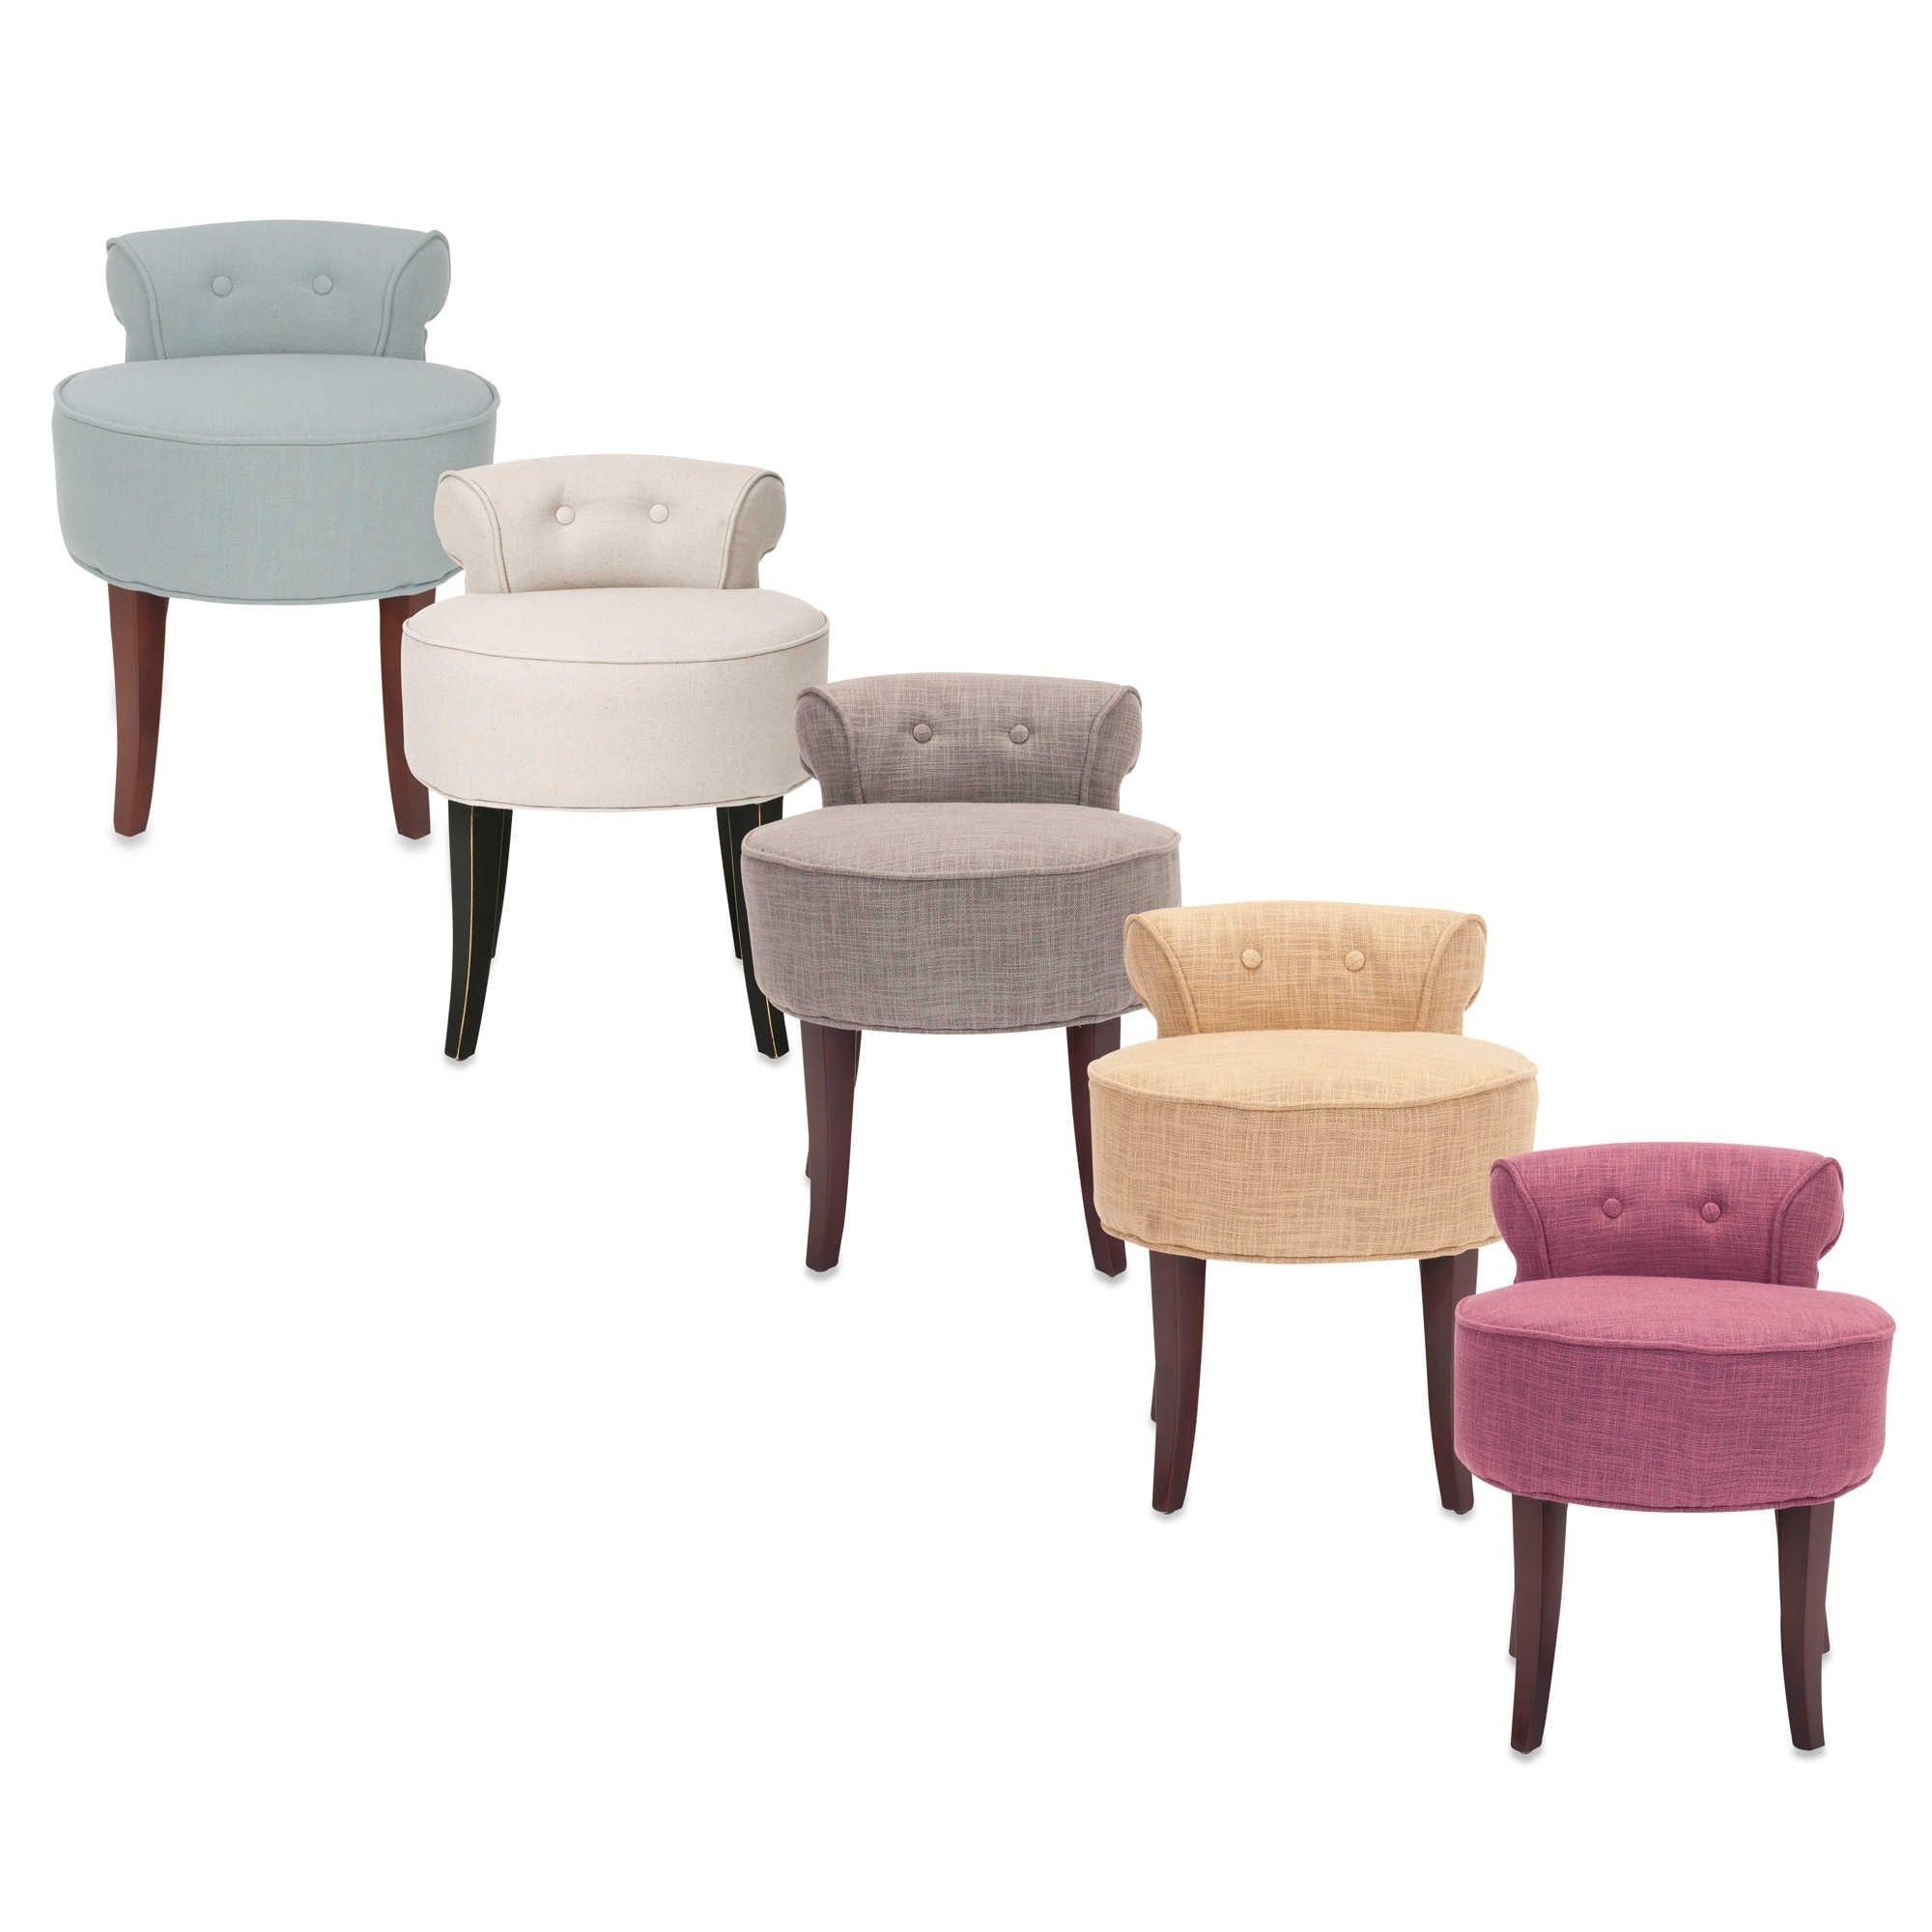 bathroom vanity chairs and stools